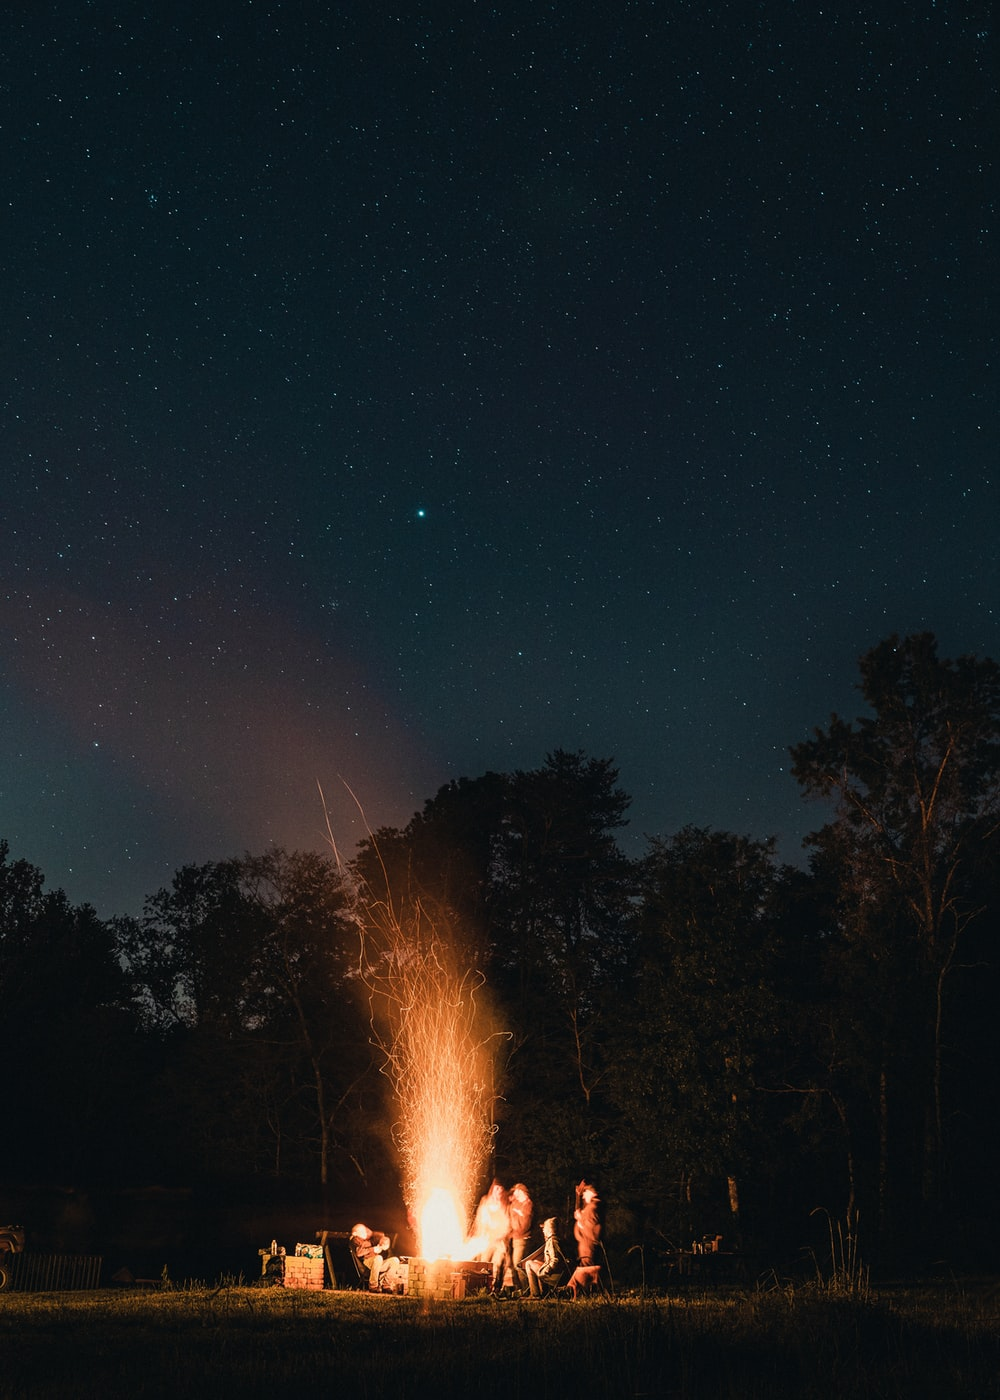 bonfire near trees during night time